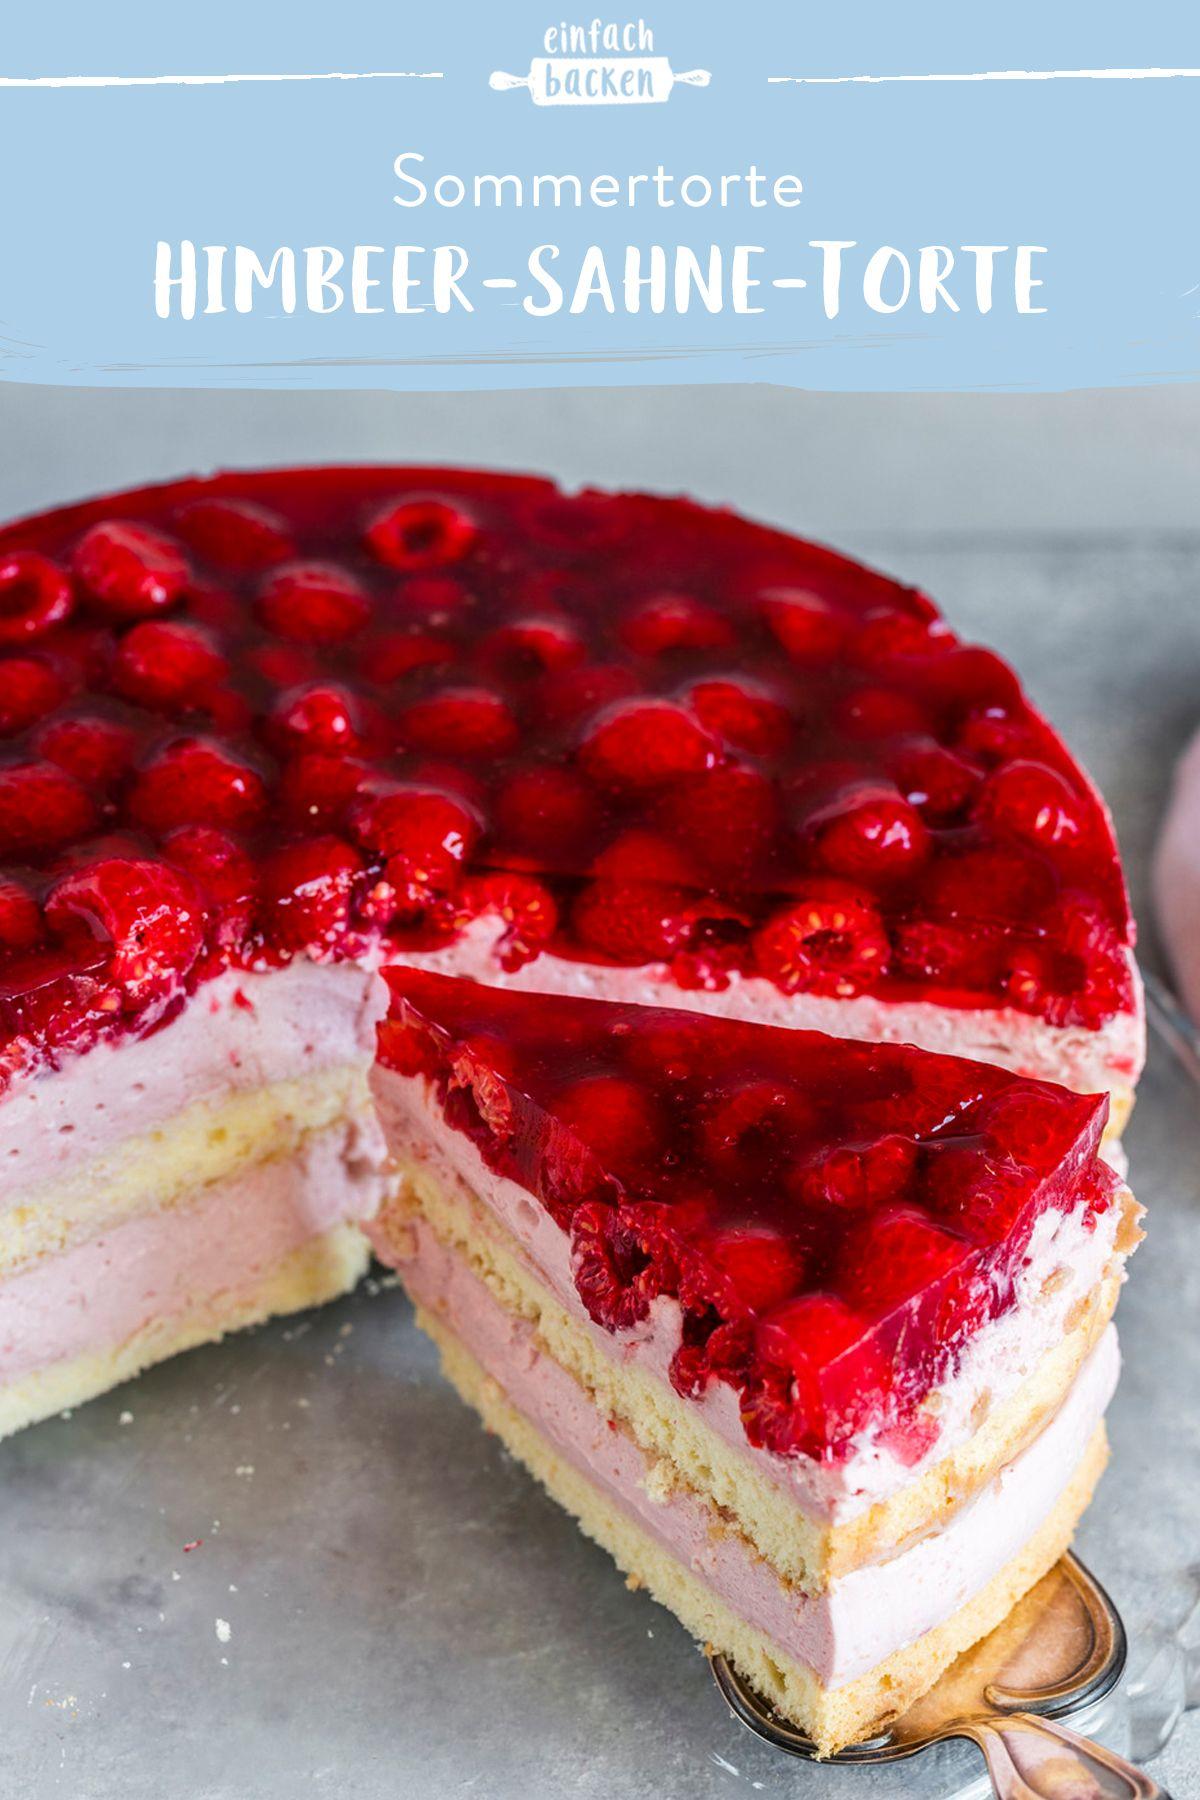 Himbeer Sahne Torte Einfaches Rezept Die Besten Backrezepte Mit Gelinggarantie Rezept In 2020 Kuchen Und Torten Rezepte Himbeer Sahne Torte Kuchen Und Torten